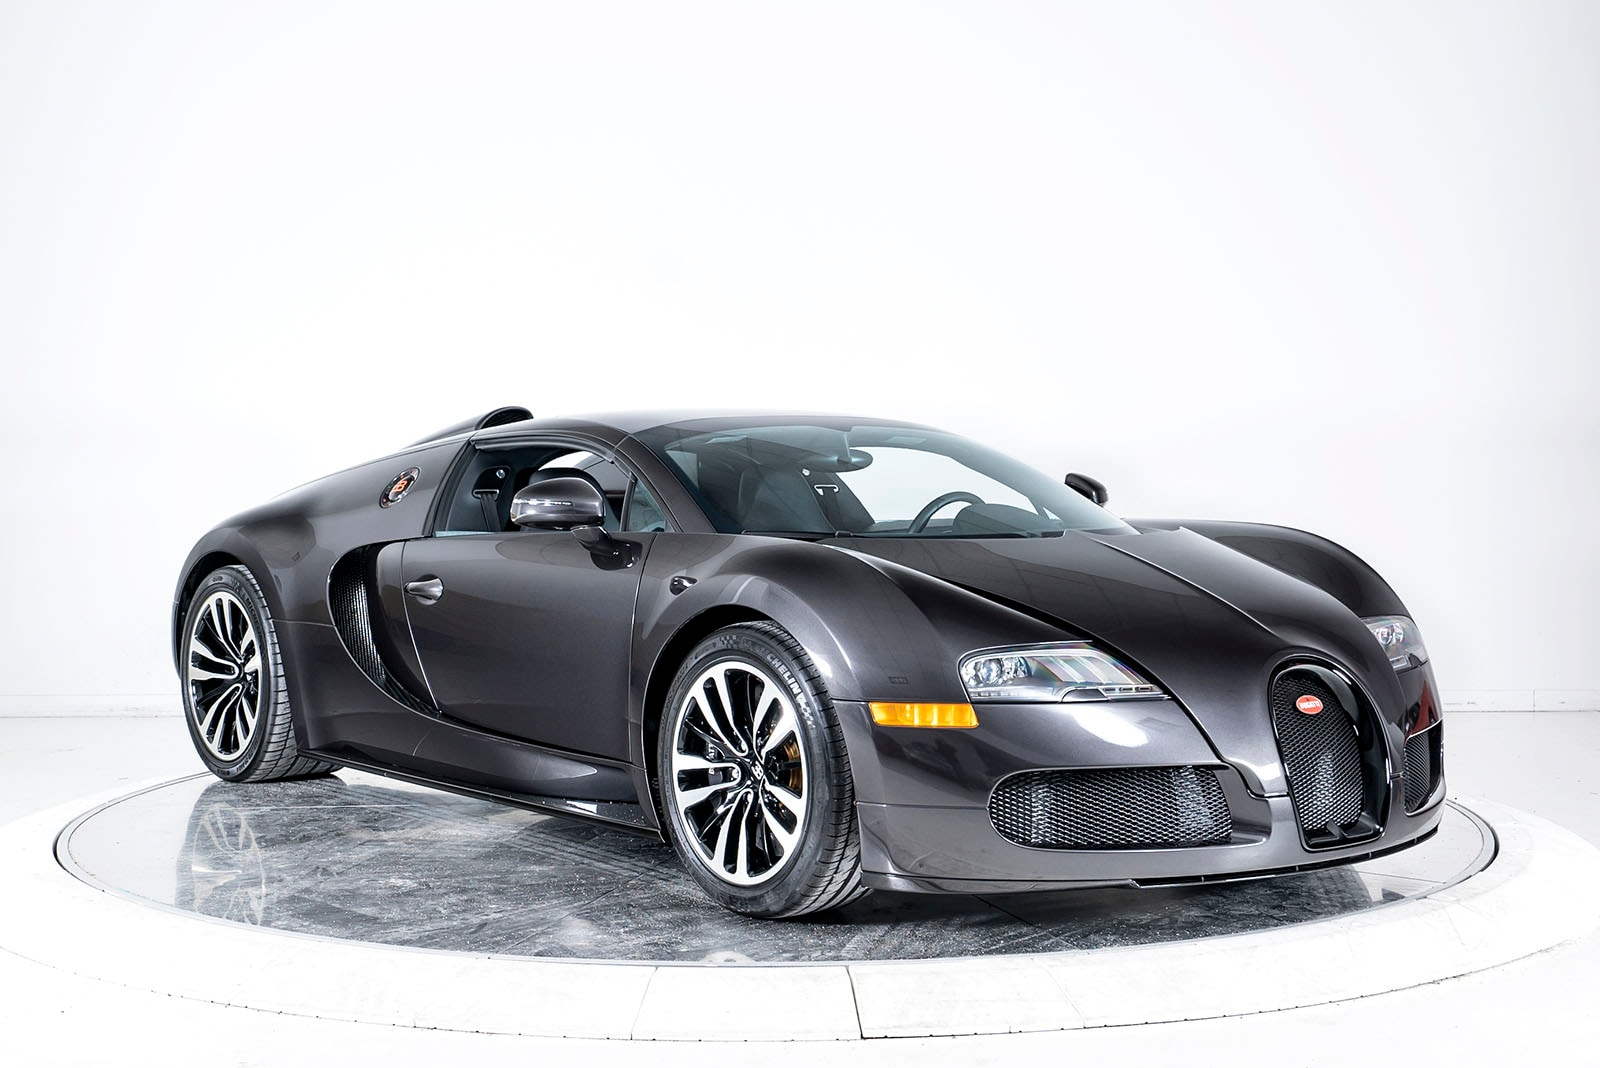 used 2012 bugatti veyron 16 4 grand sport for sale plainview near long island ny vin. Black Bedroom Furniture Sets. Home Design Ideas